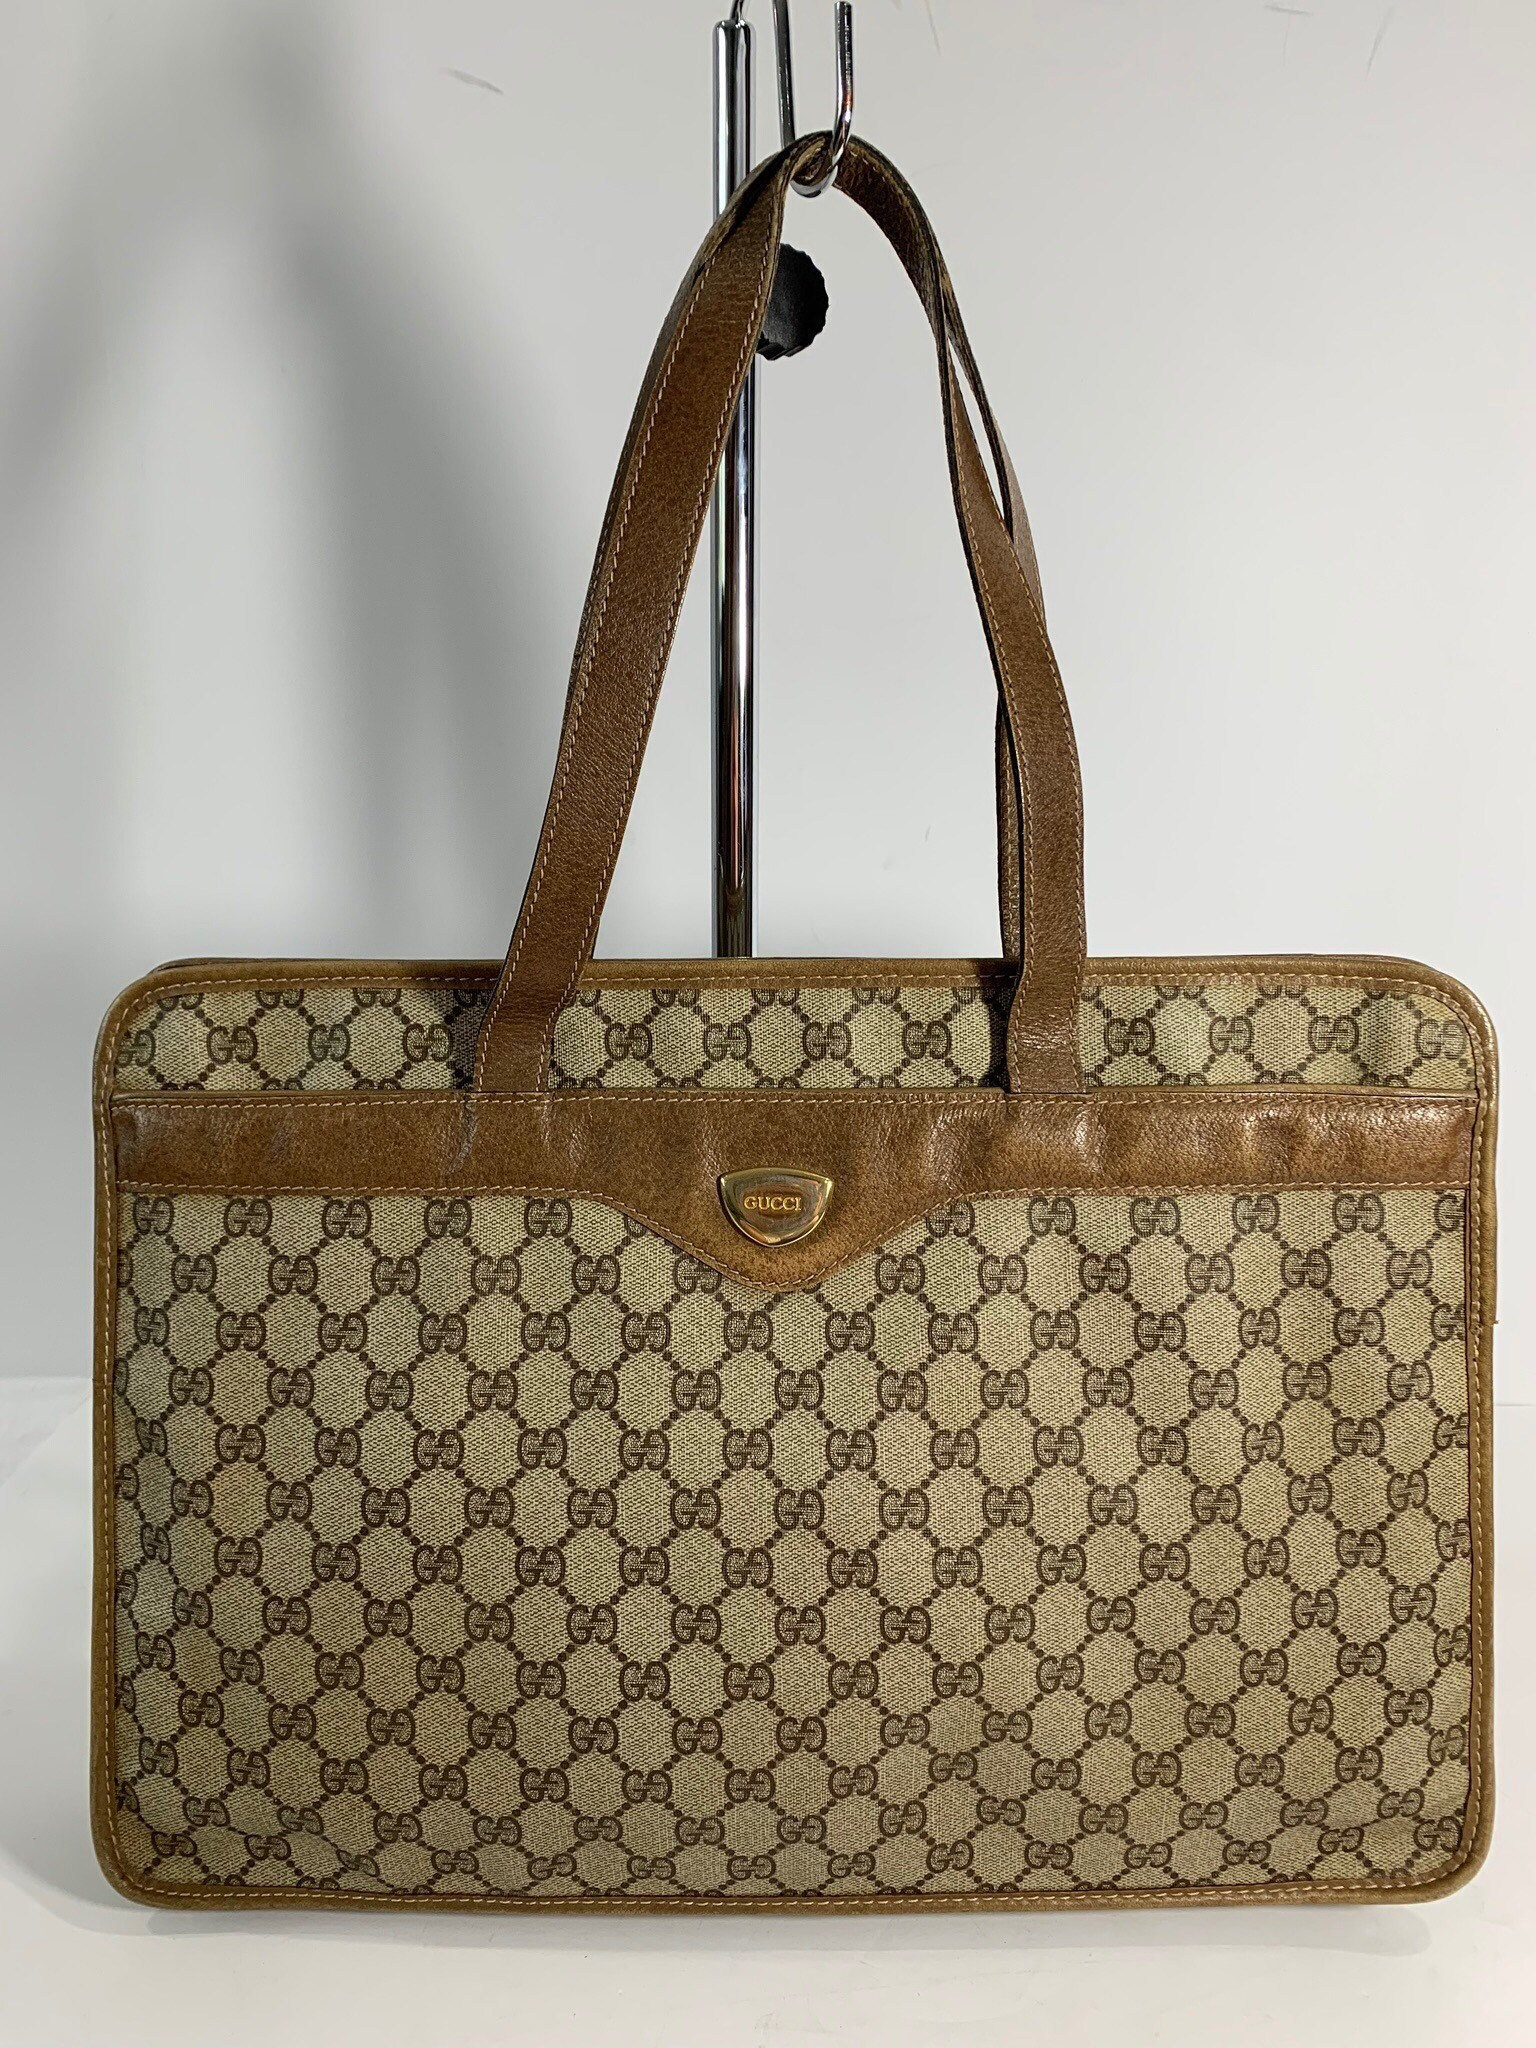 e2b89275376e5 GUCCI Rare Authentic Brown Canvas Leather Trim Business Shopper Shoulder Tote  Bag Made in Italy